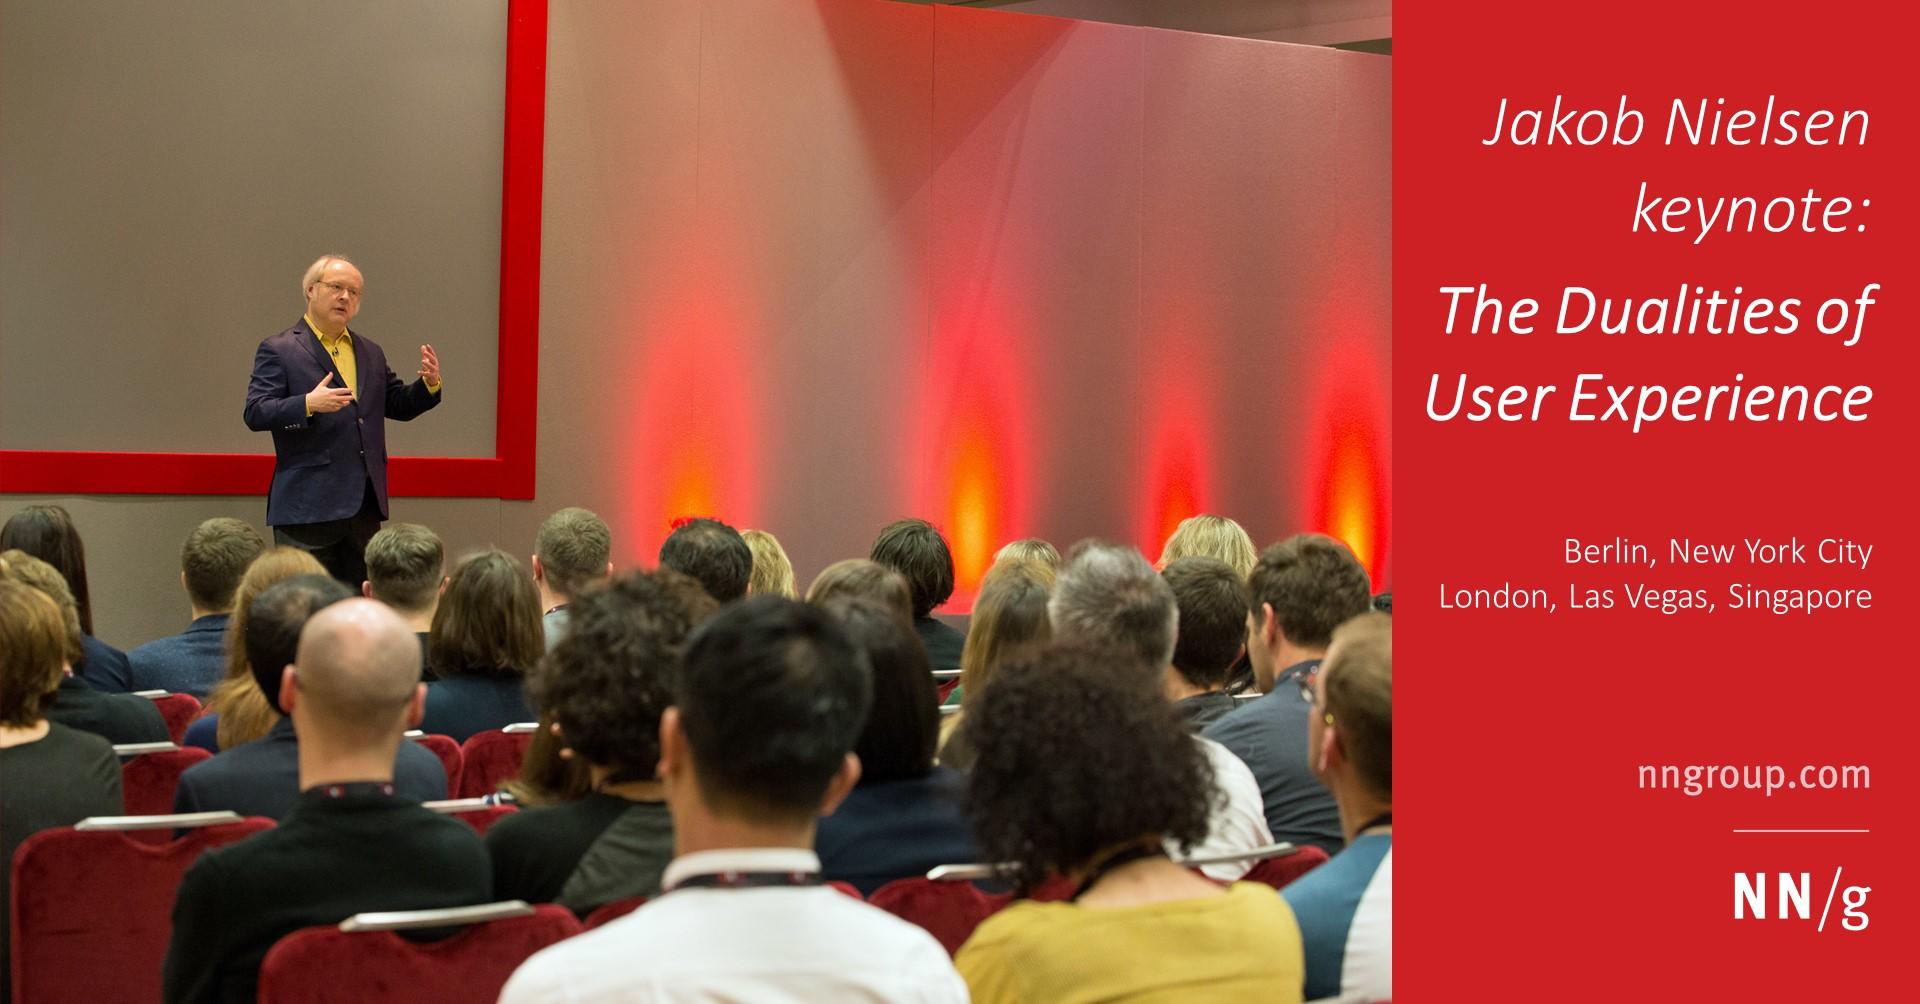 Jakob Nielsen keynote: The Dualities of User Experience (UX